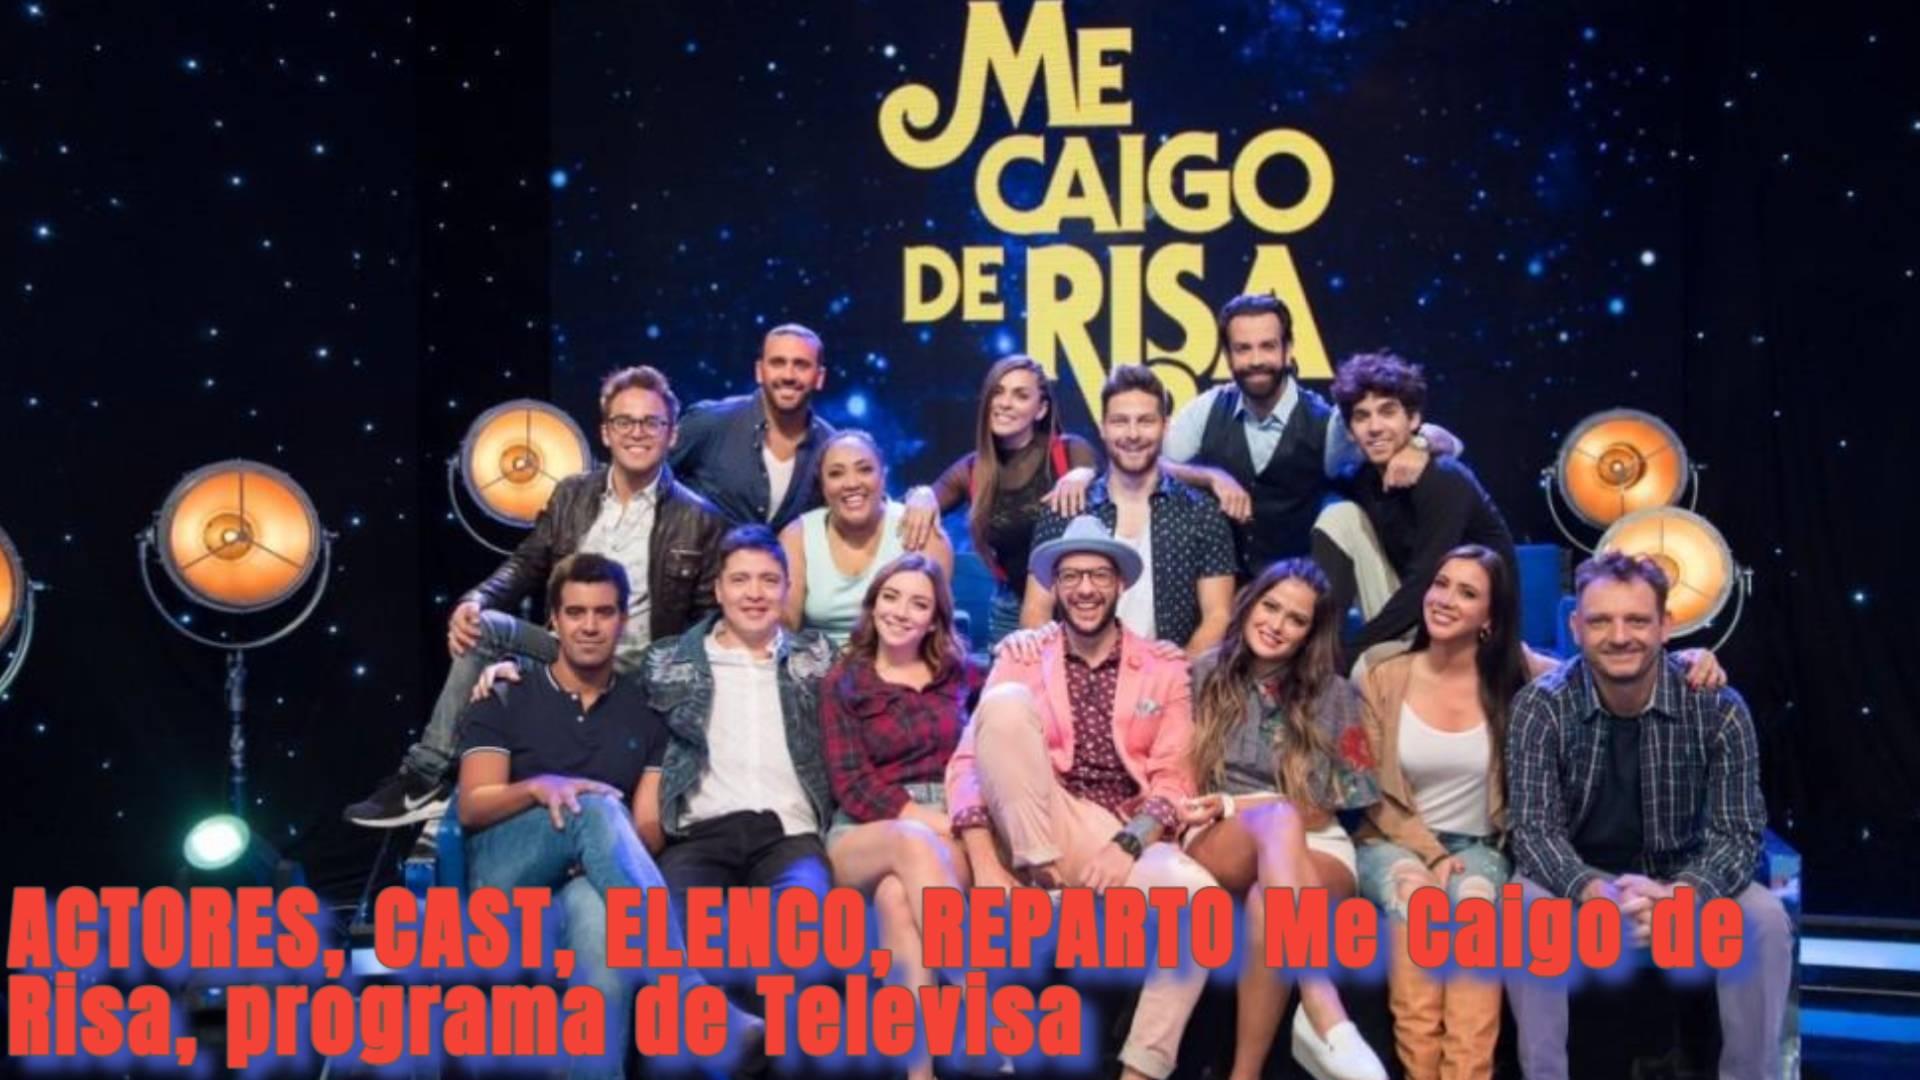 ACTORES, CAST, ELENCO, REPARTO Me Caigo de Risa, programa de Televisa